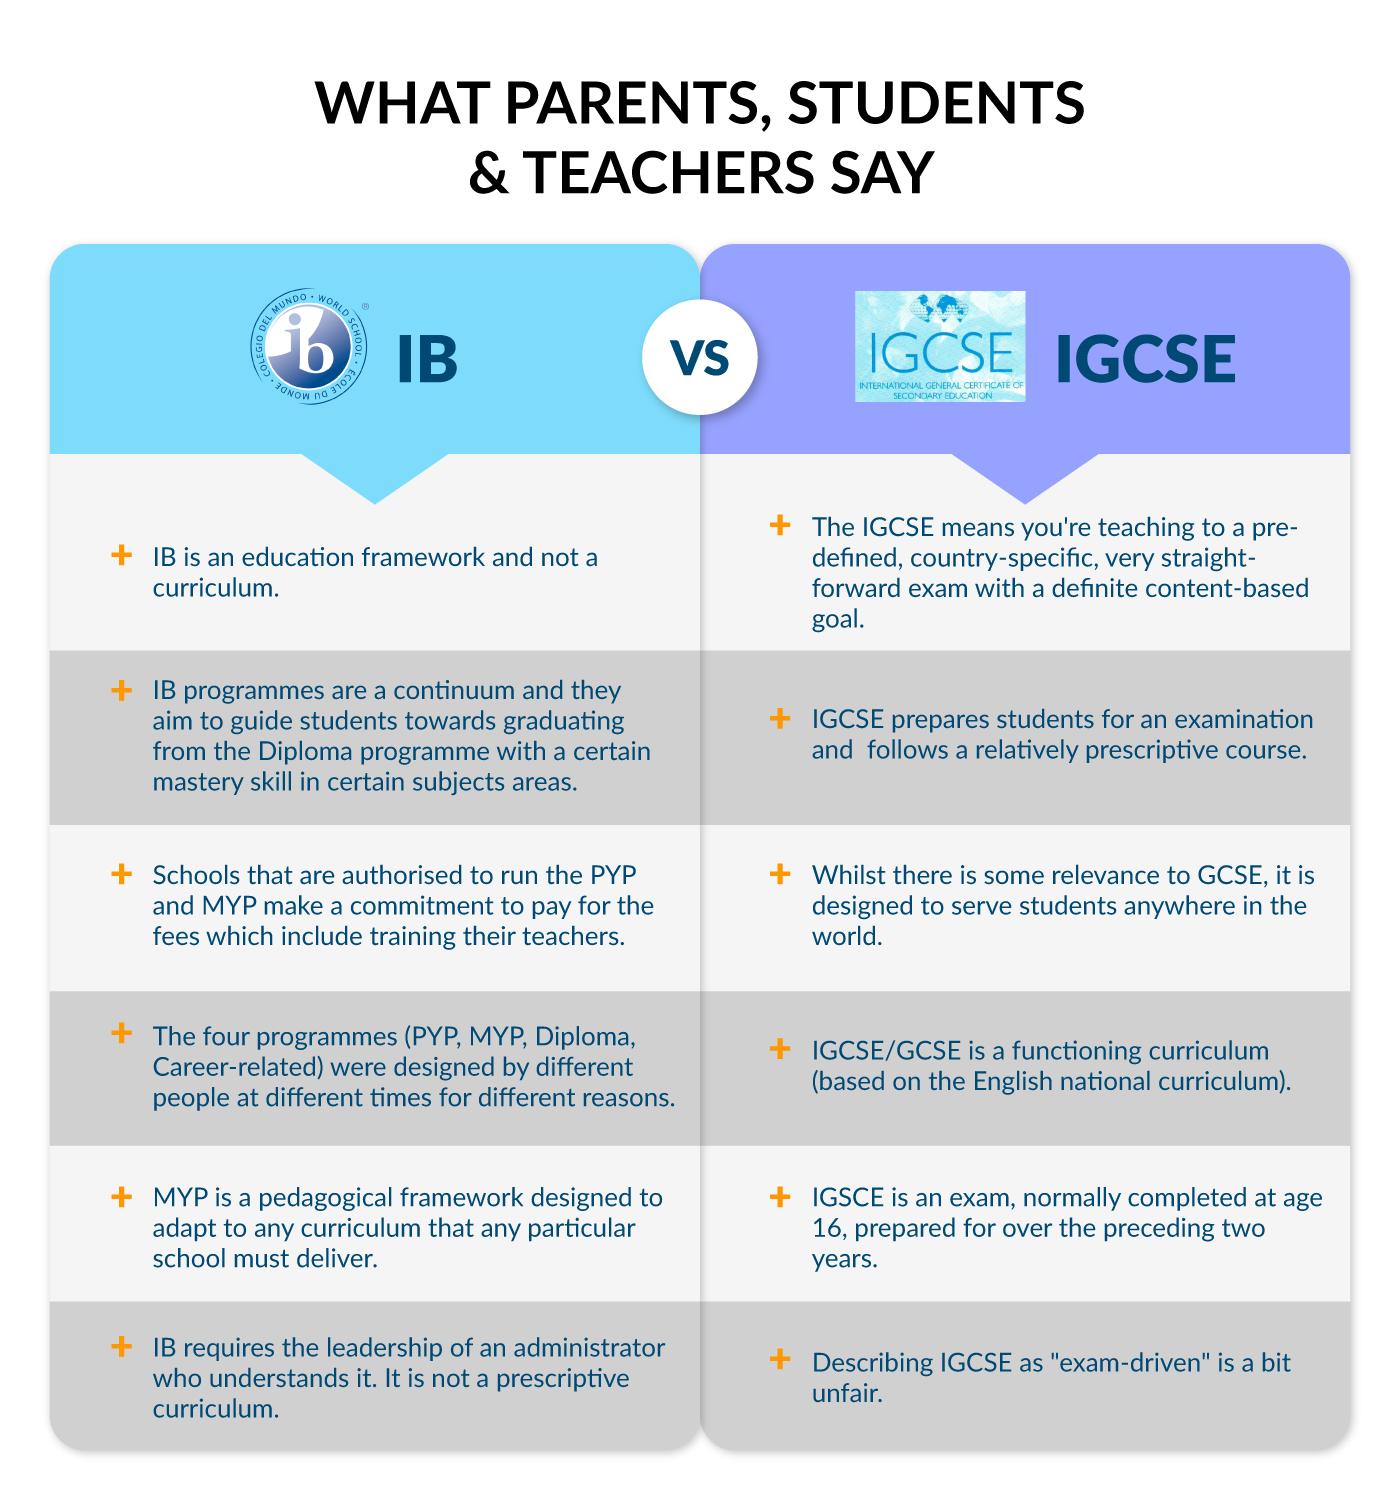 IB vs IGCSE Important Information